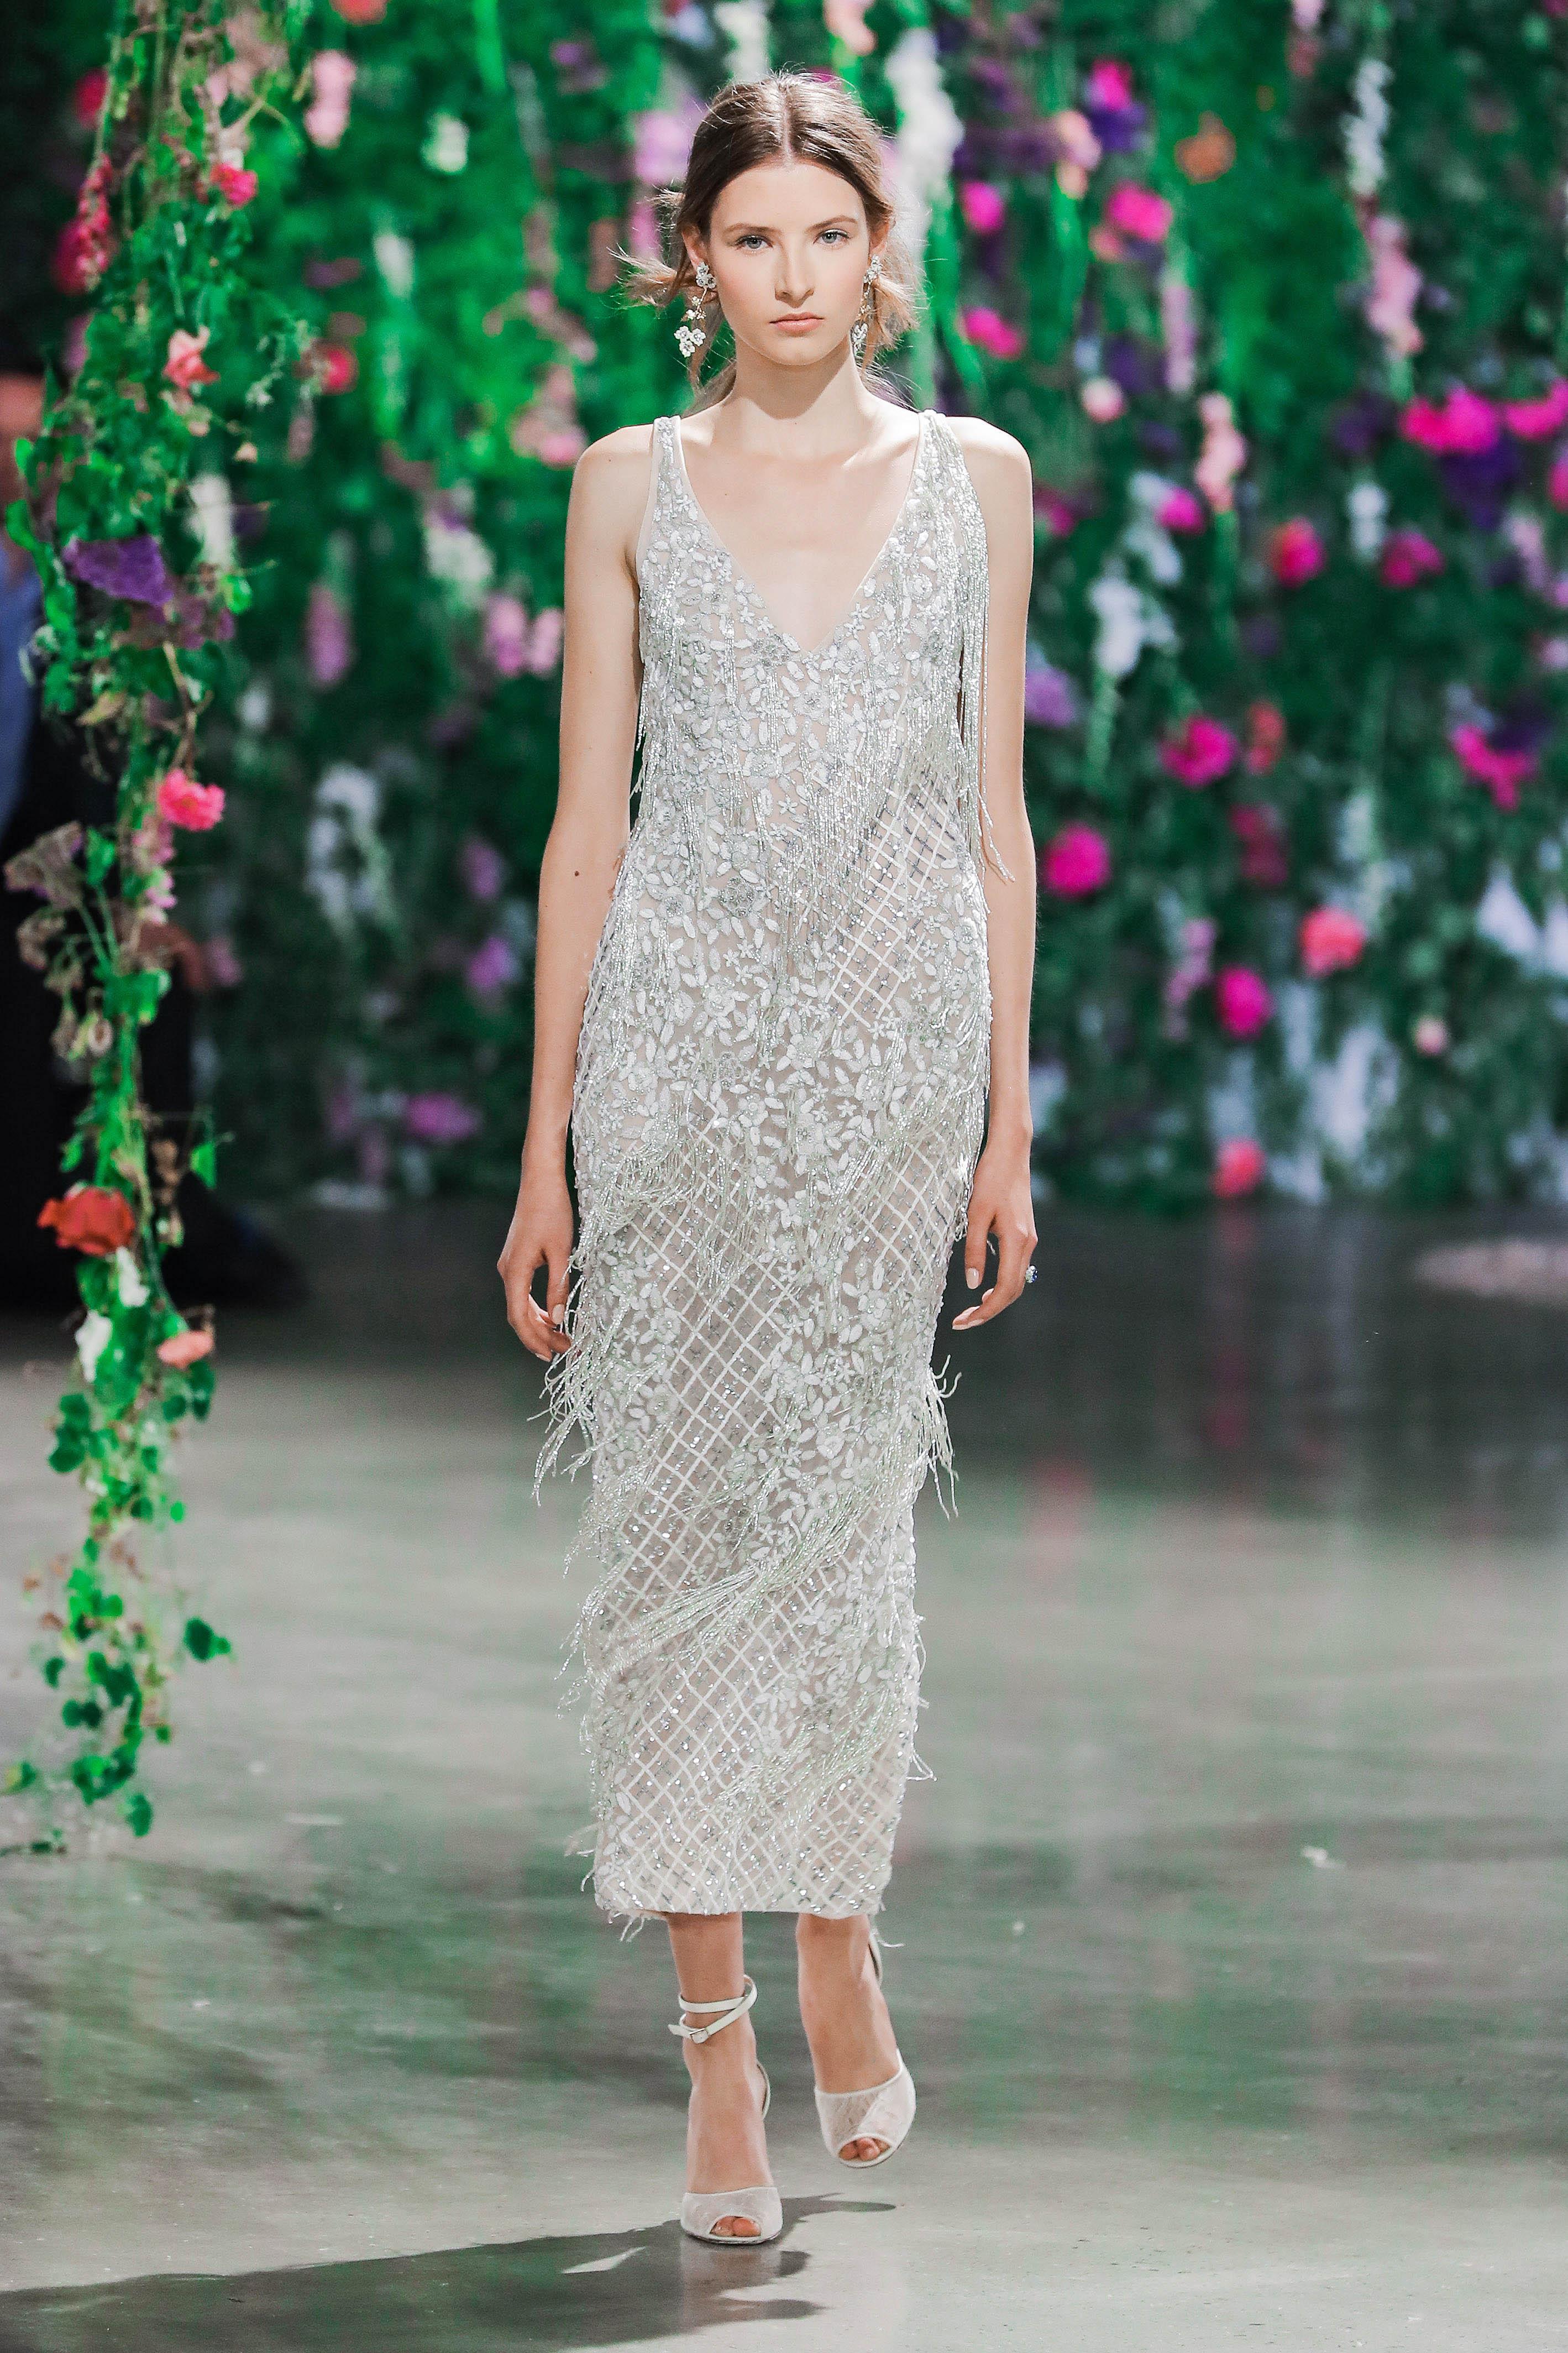 Galia Lahav Embellished Sheath Wedding Dress Fall 2018